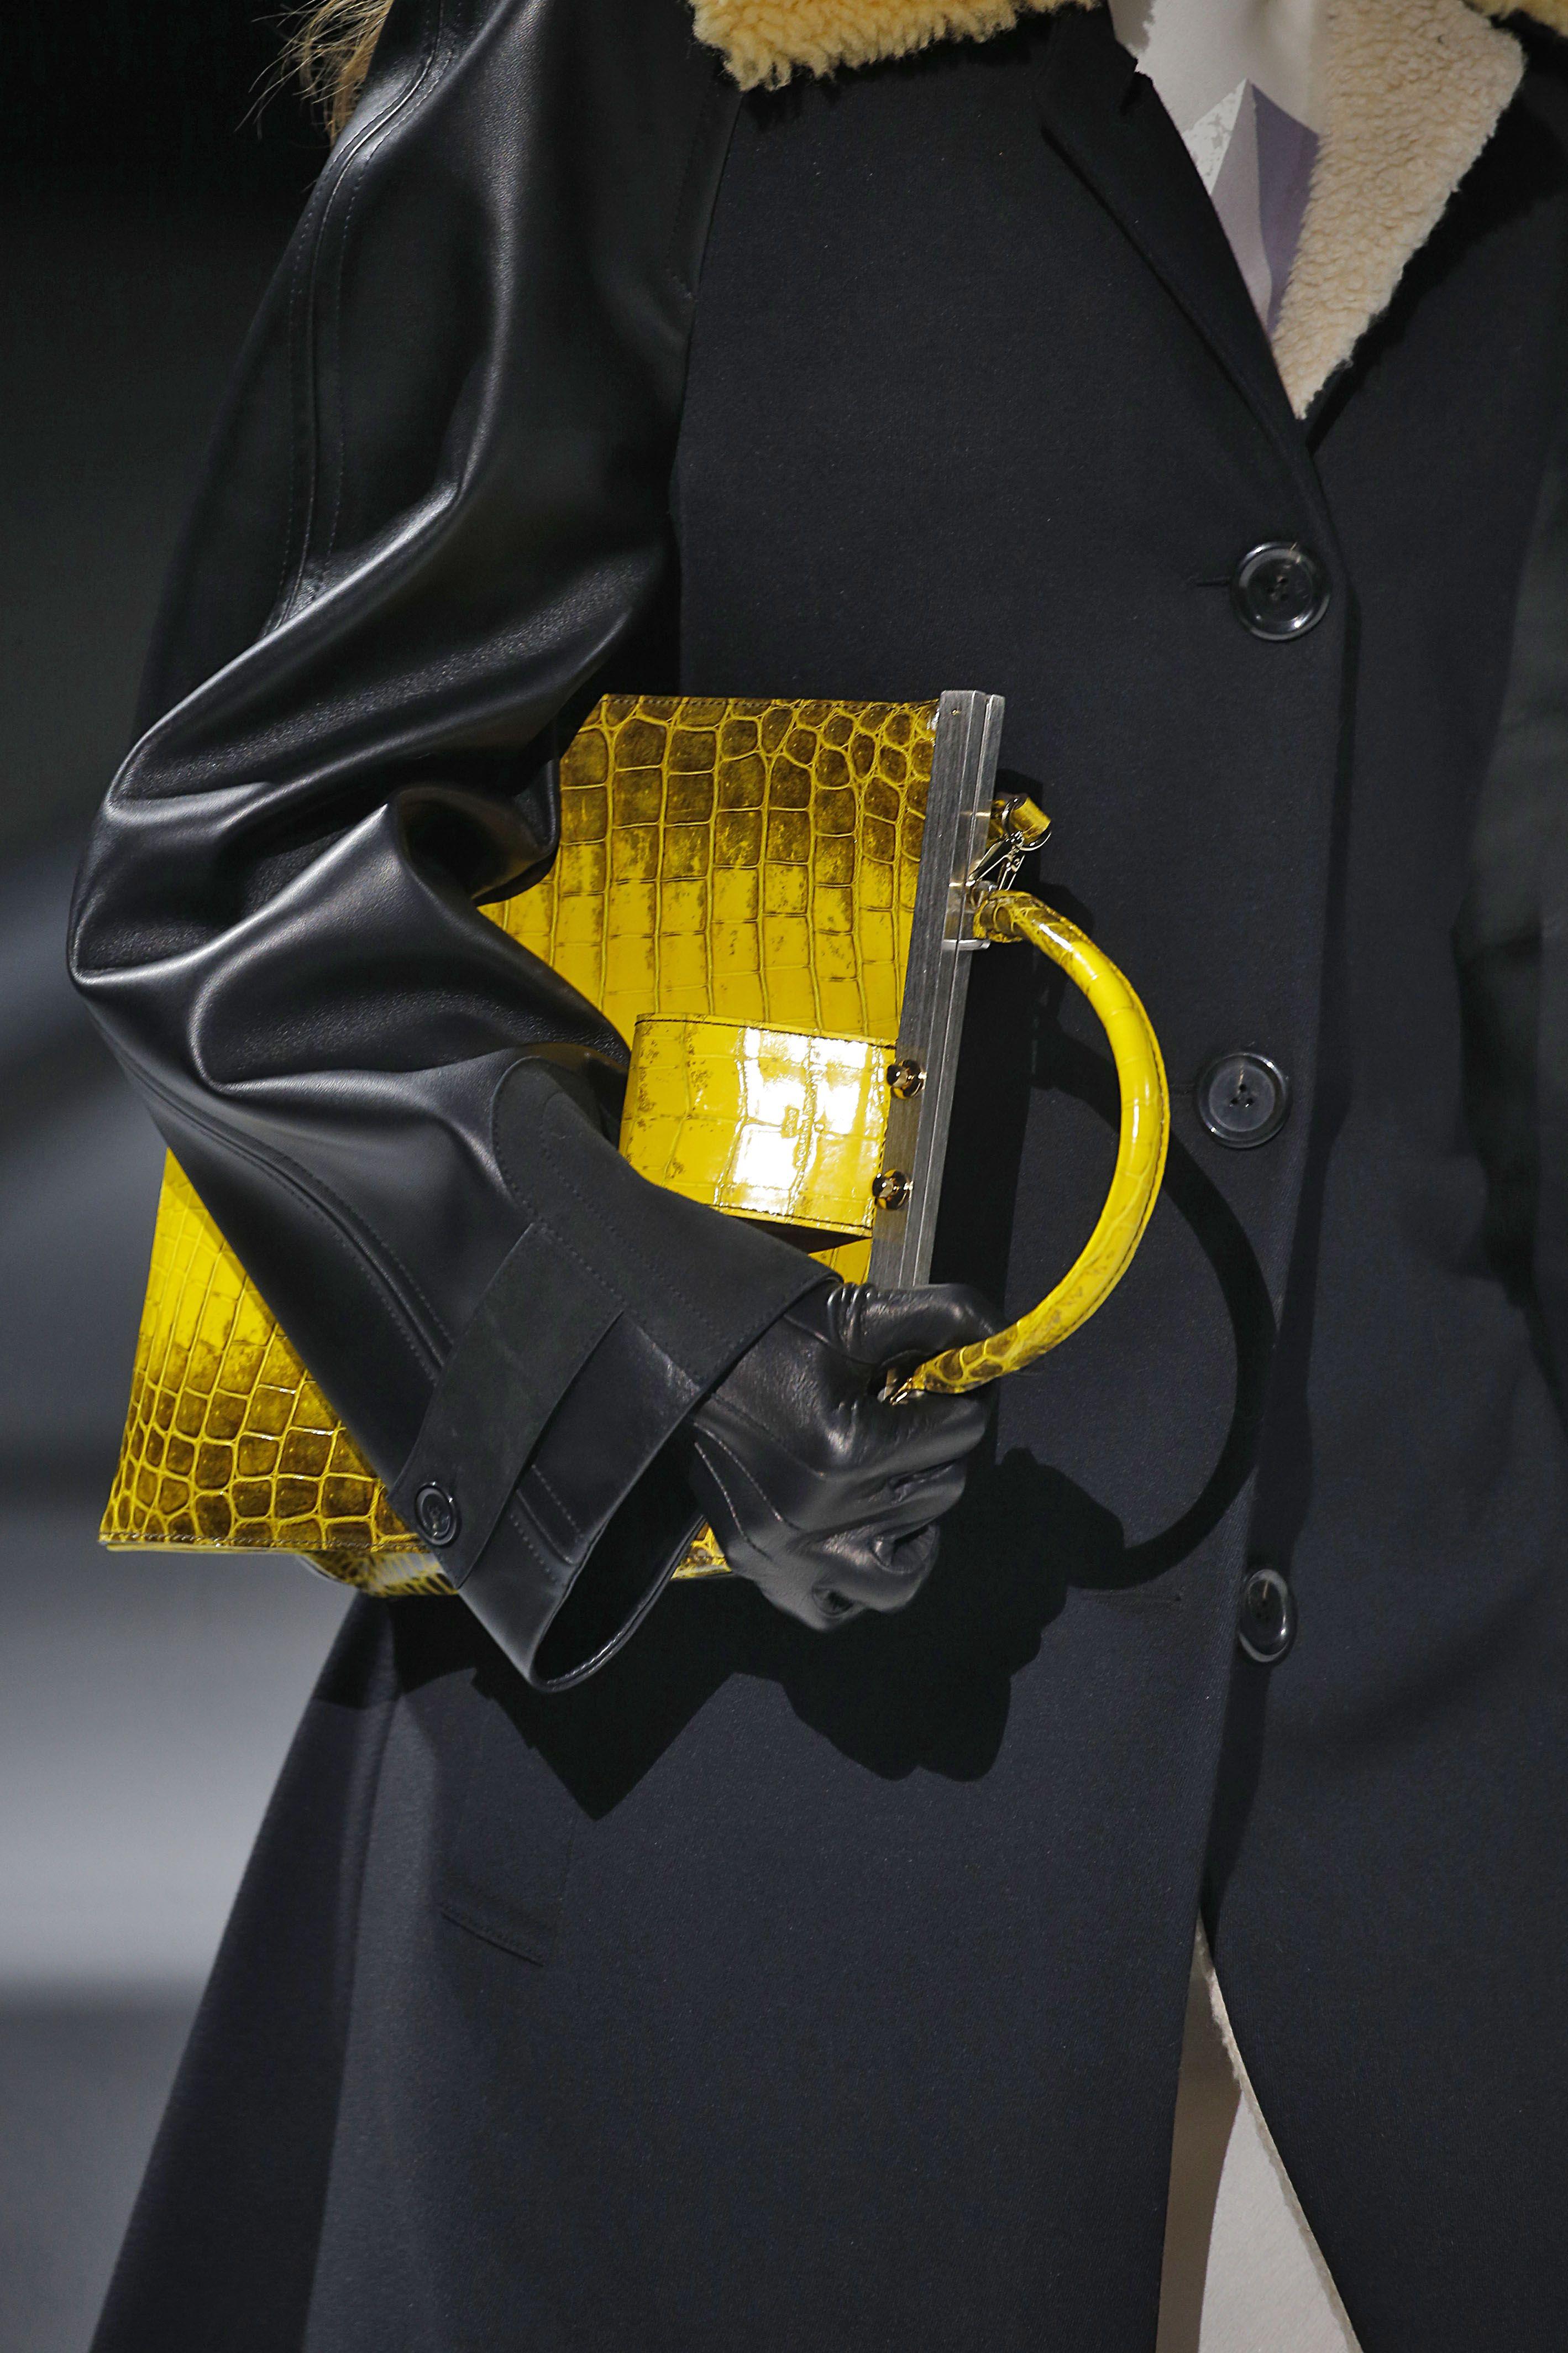 Louis Vuitton / Fall 2018 / Paris Louis vuitton, Fashion